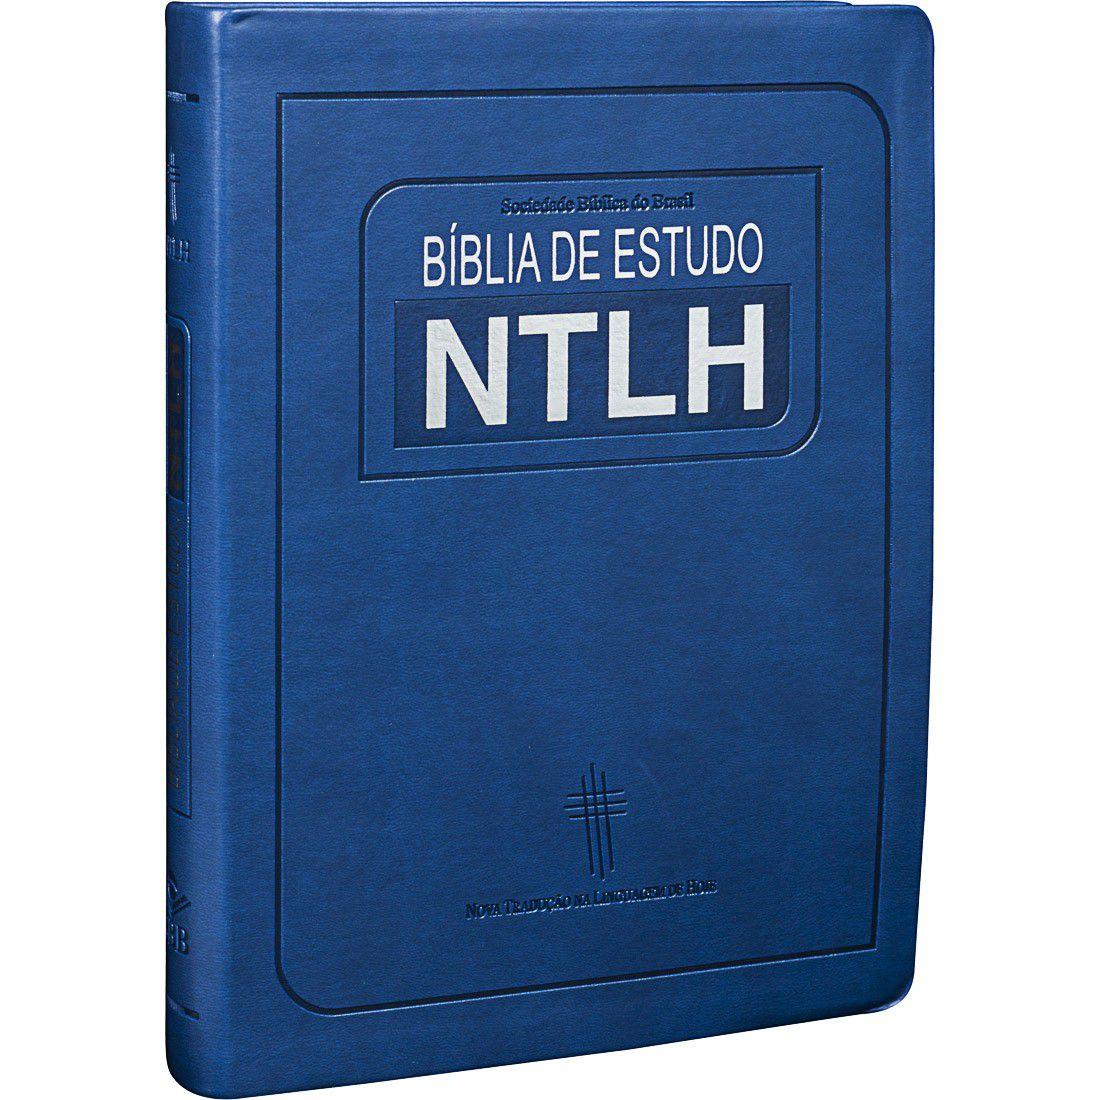 Bíblia de Estudo SBB NTLH Luxo Grande  - Livraria Betel